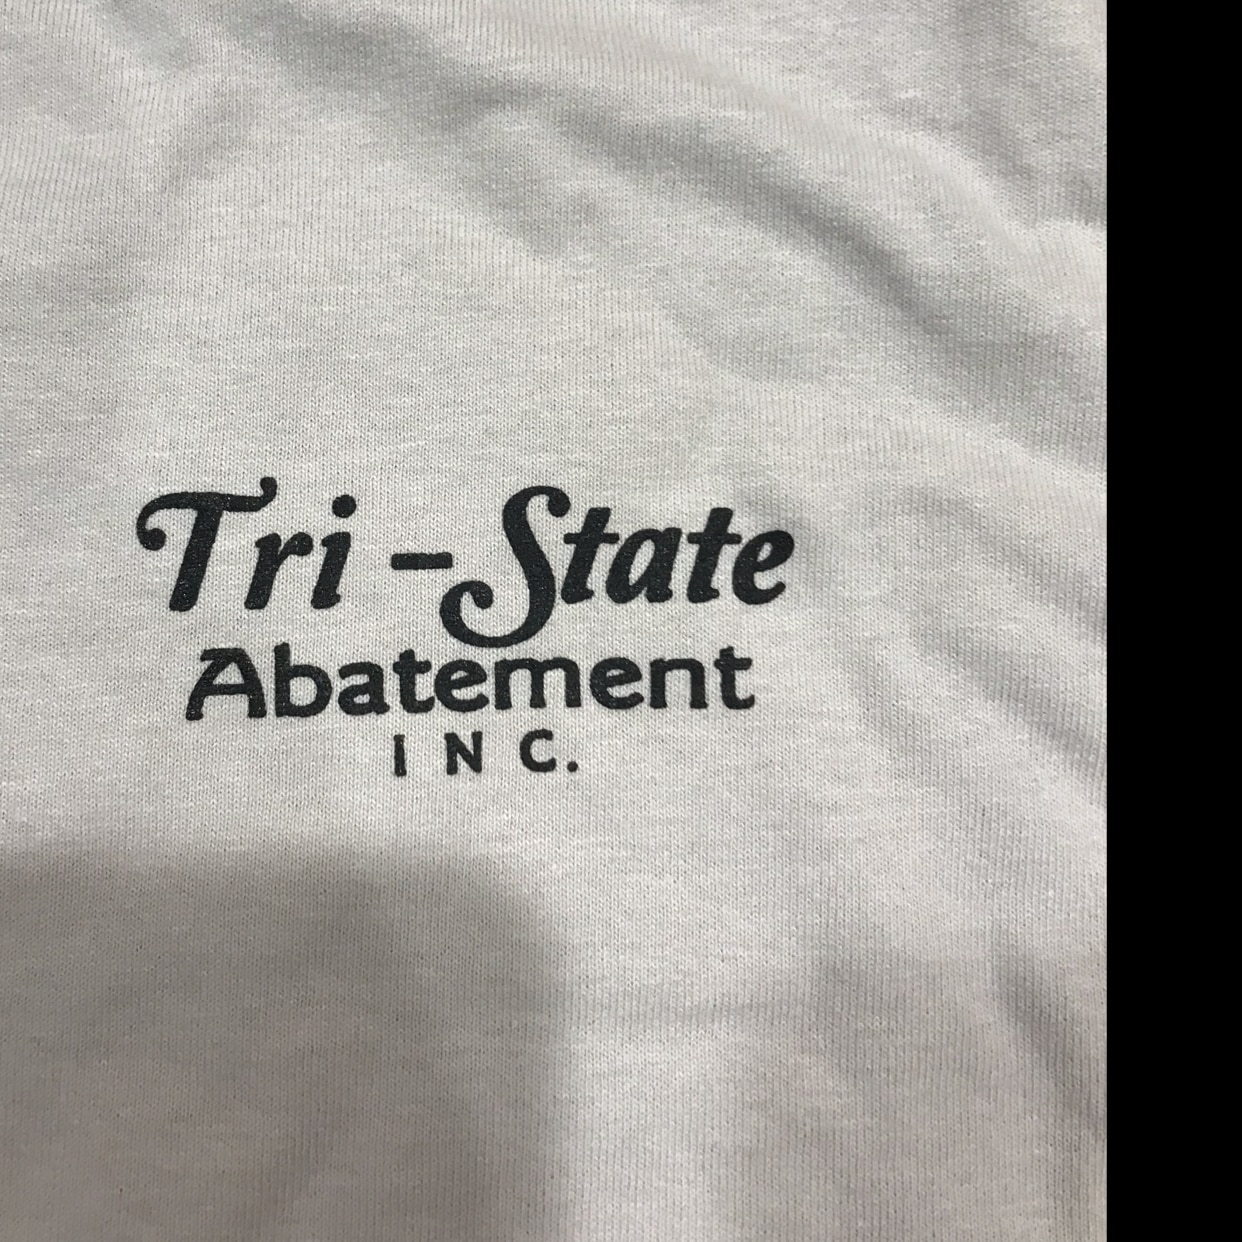 Tri-state Abatement, Inc. logo